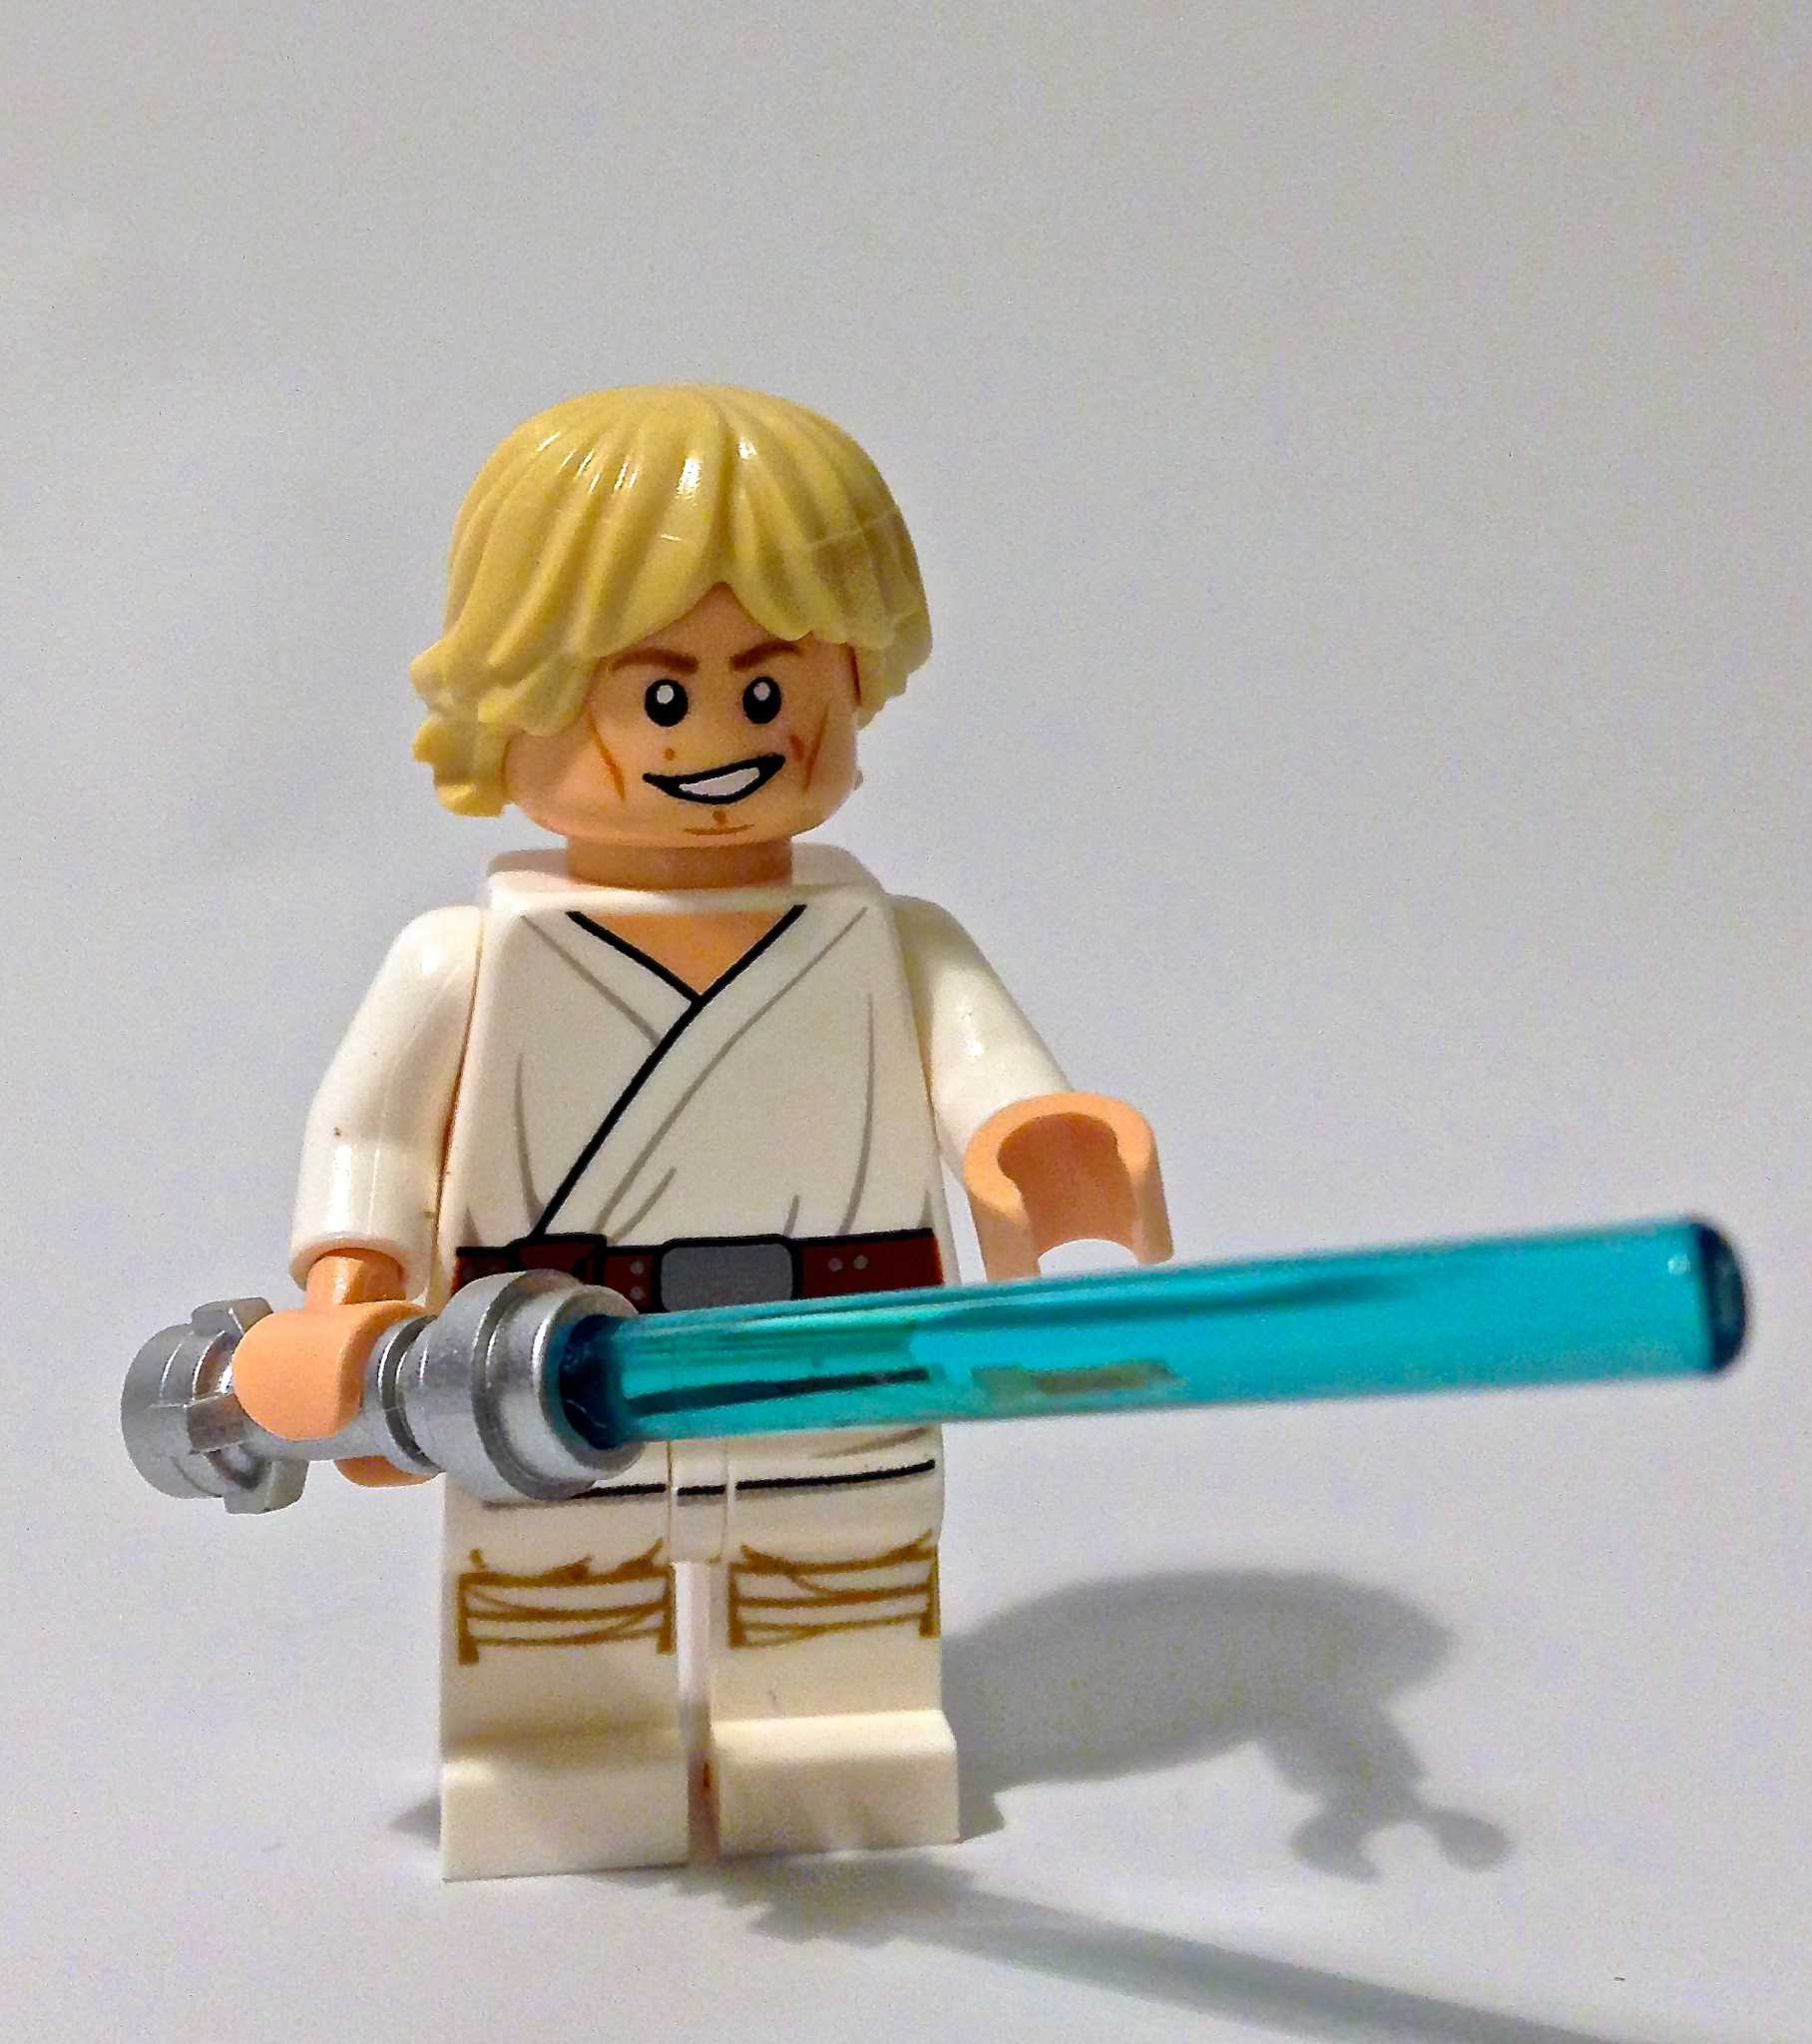 New LEGO® Star Wars™ Luke Skywalker Minifigure from the UCS Sandcrawler (75059) New! Mint! by ...